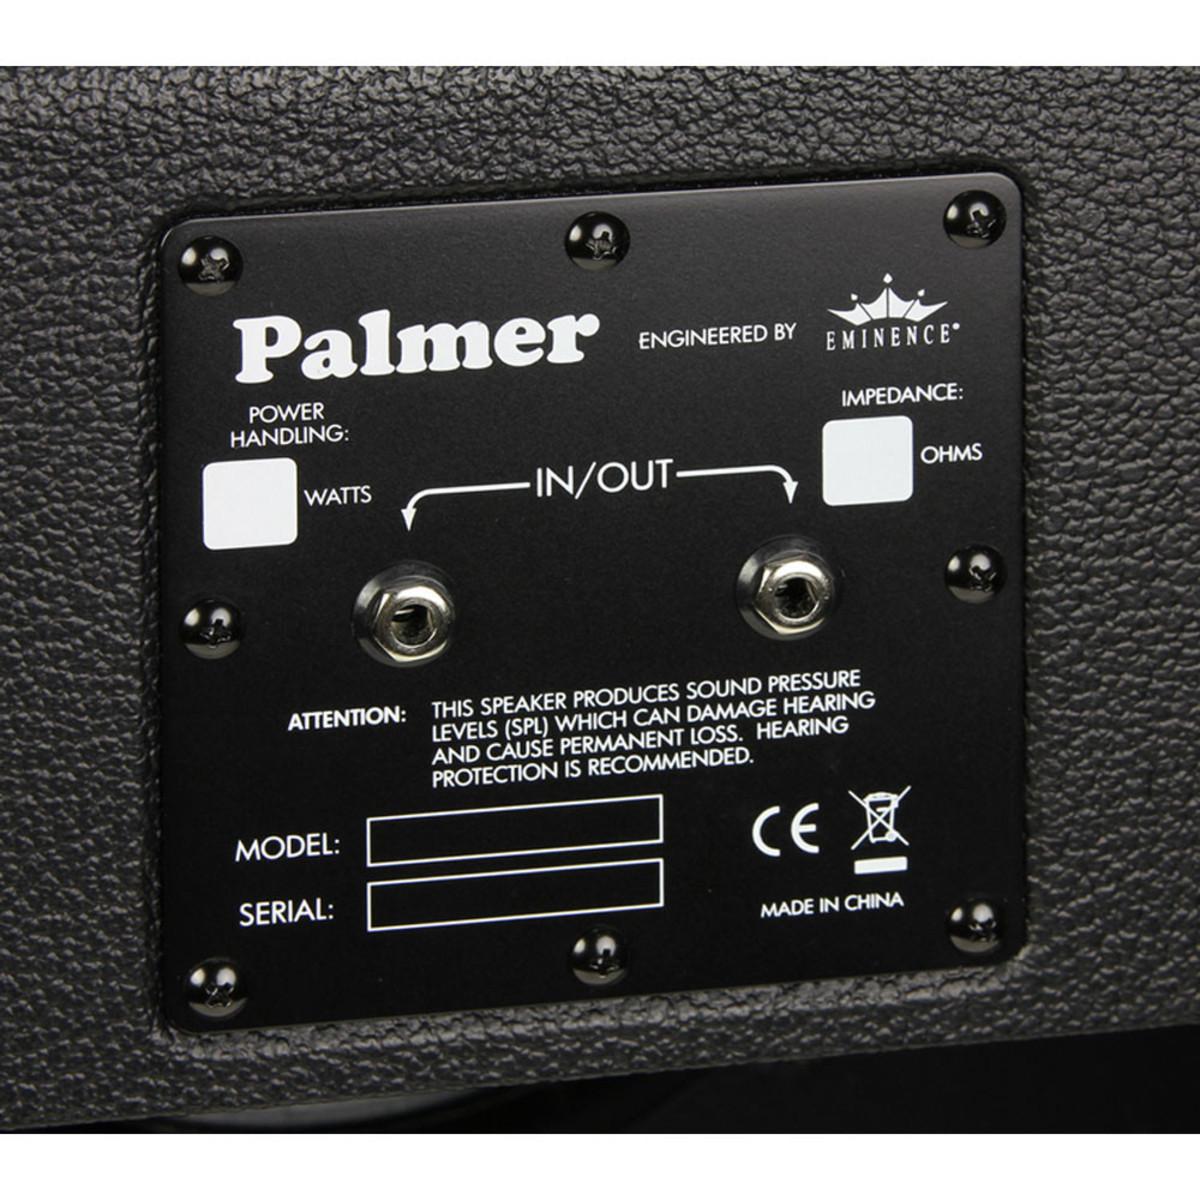 1x12 Guitar Cabinet Empty Palmer Pcab112b 1 X 12 Empty Guitar Cabinet At Gear4musiccom